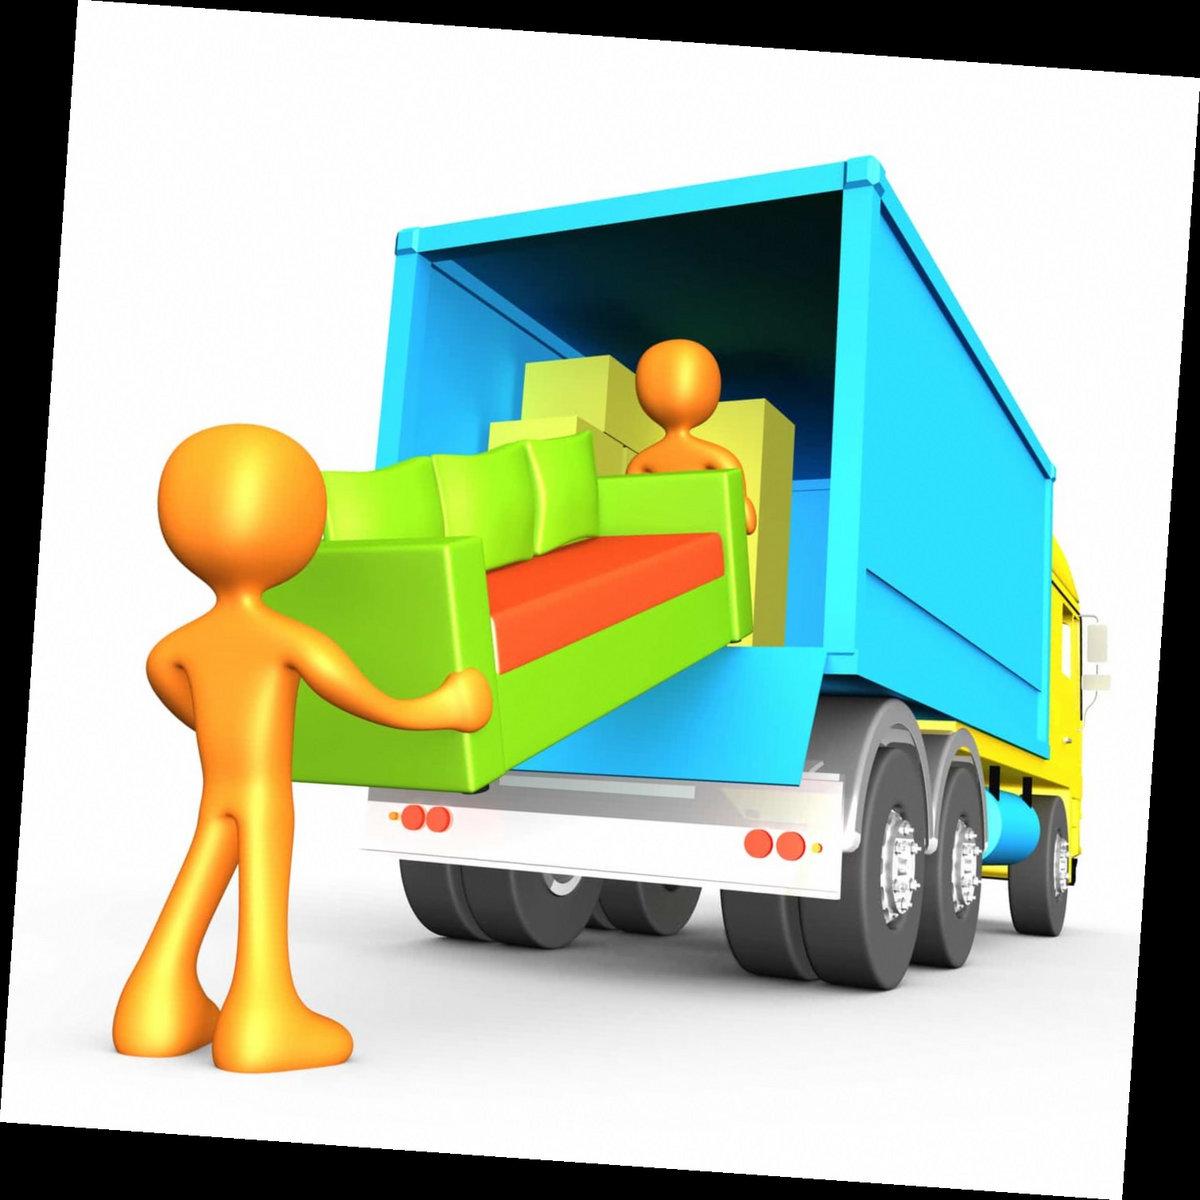 U Haul Moving Truck >> 1 855 789 2734 U Haul Moving Van Rental Prices Conn Jenny